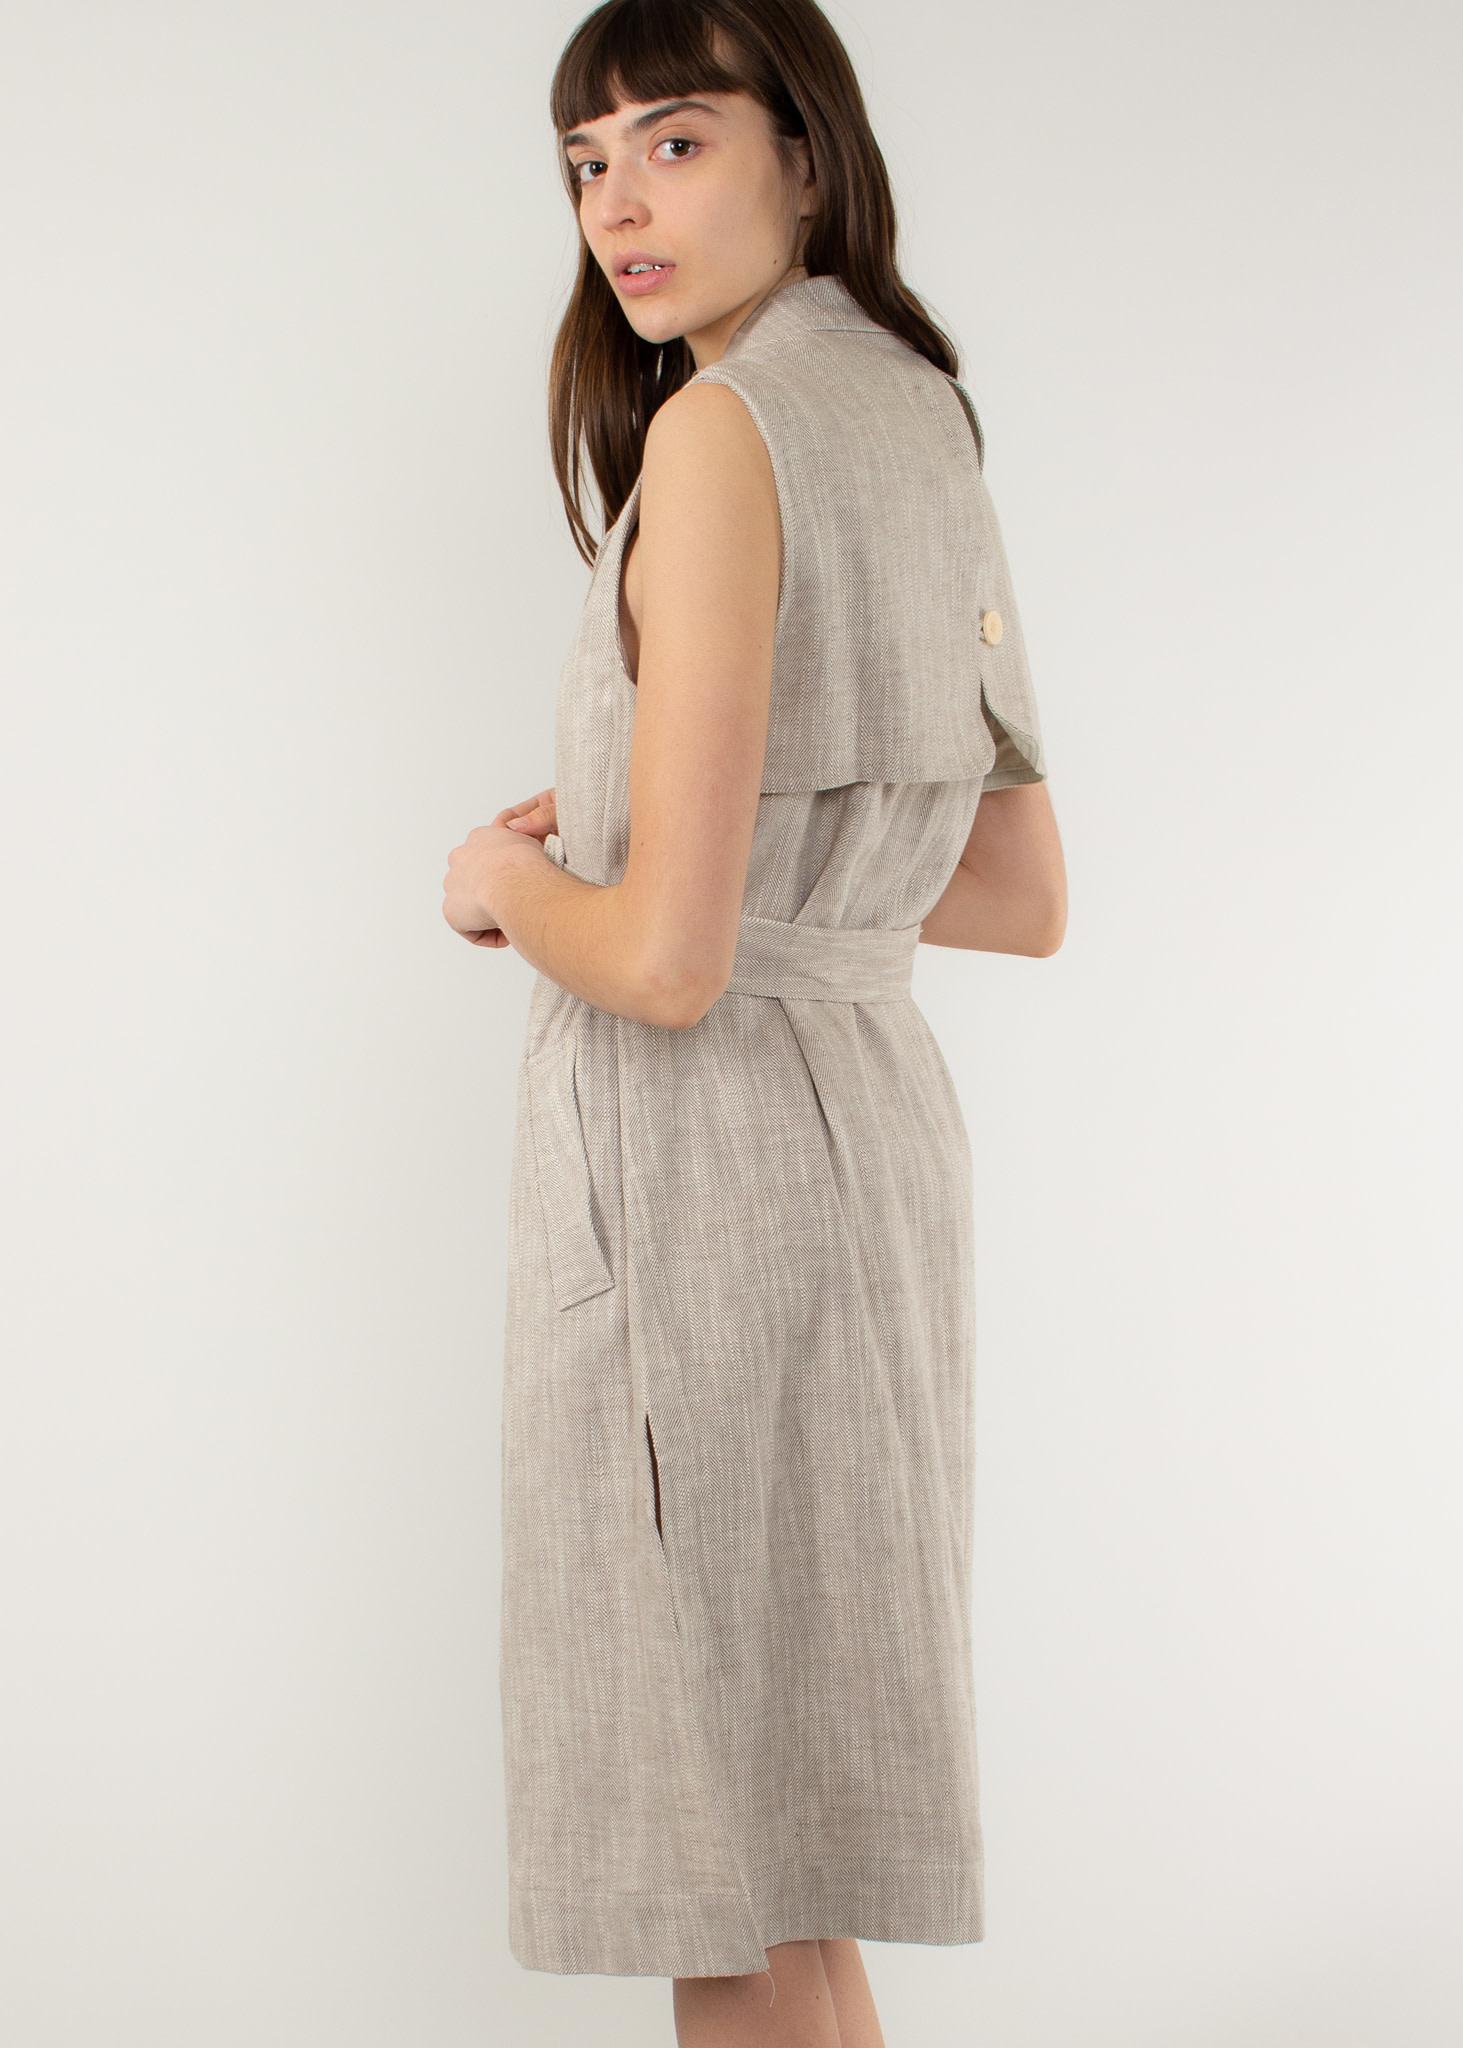 The Korner 20166022 dress